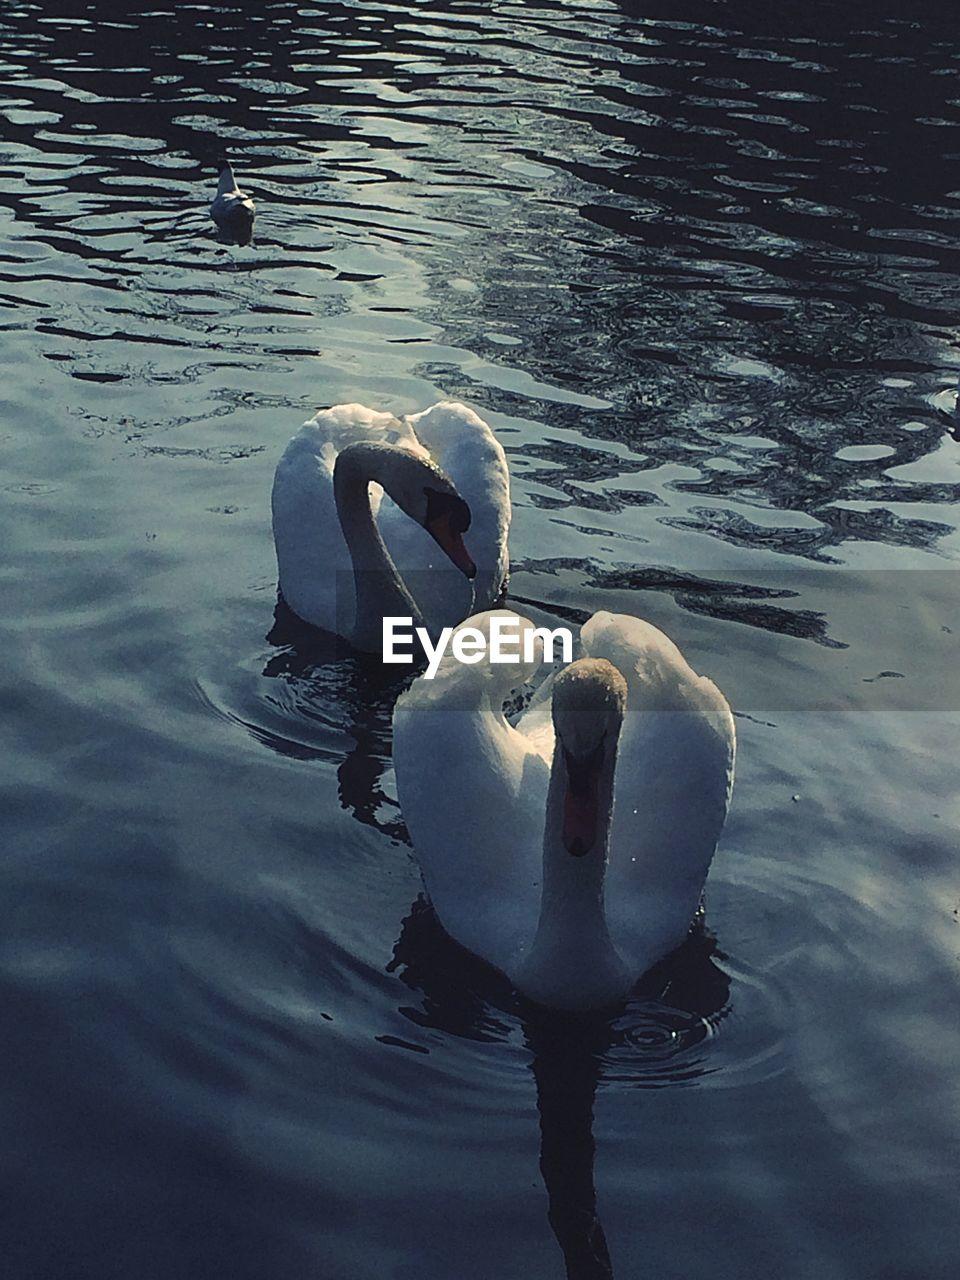 swan, animal themes, animals in the wild, water, reflection, bird, lake, swimming, water bird, one animal, no people, animal wildlife, rippled, day, outdoors, nature, beak, beauty in nature